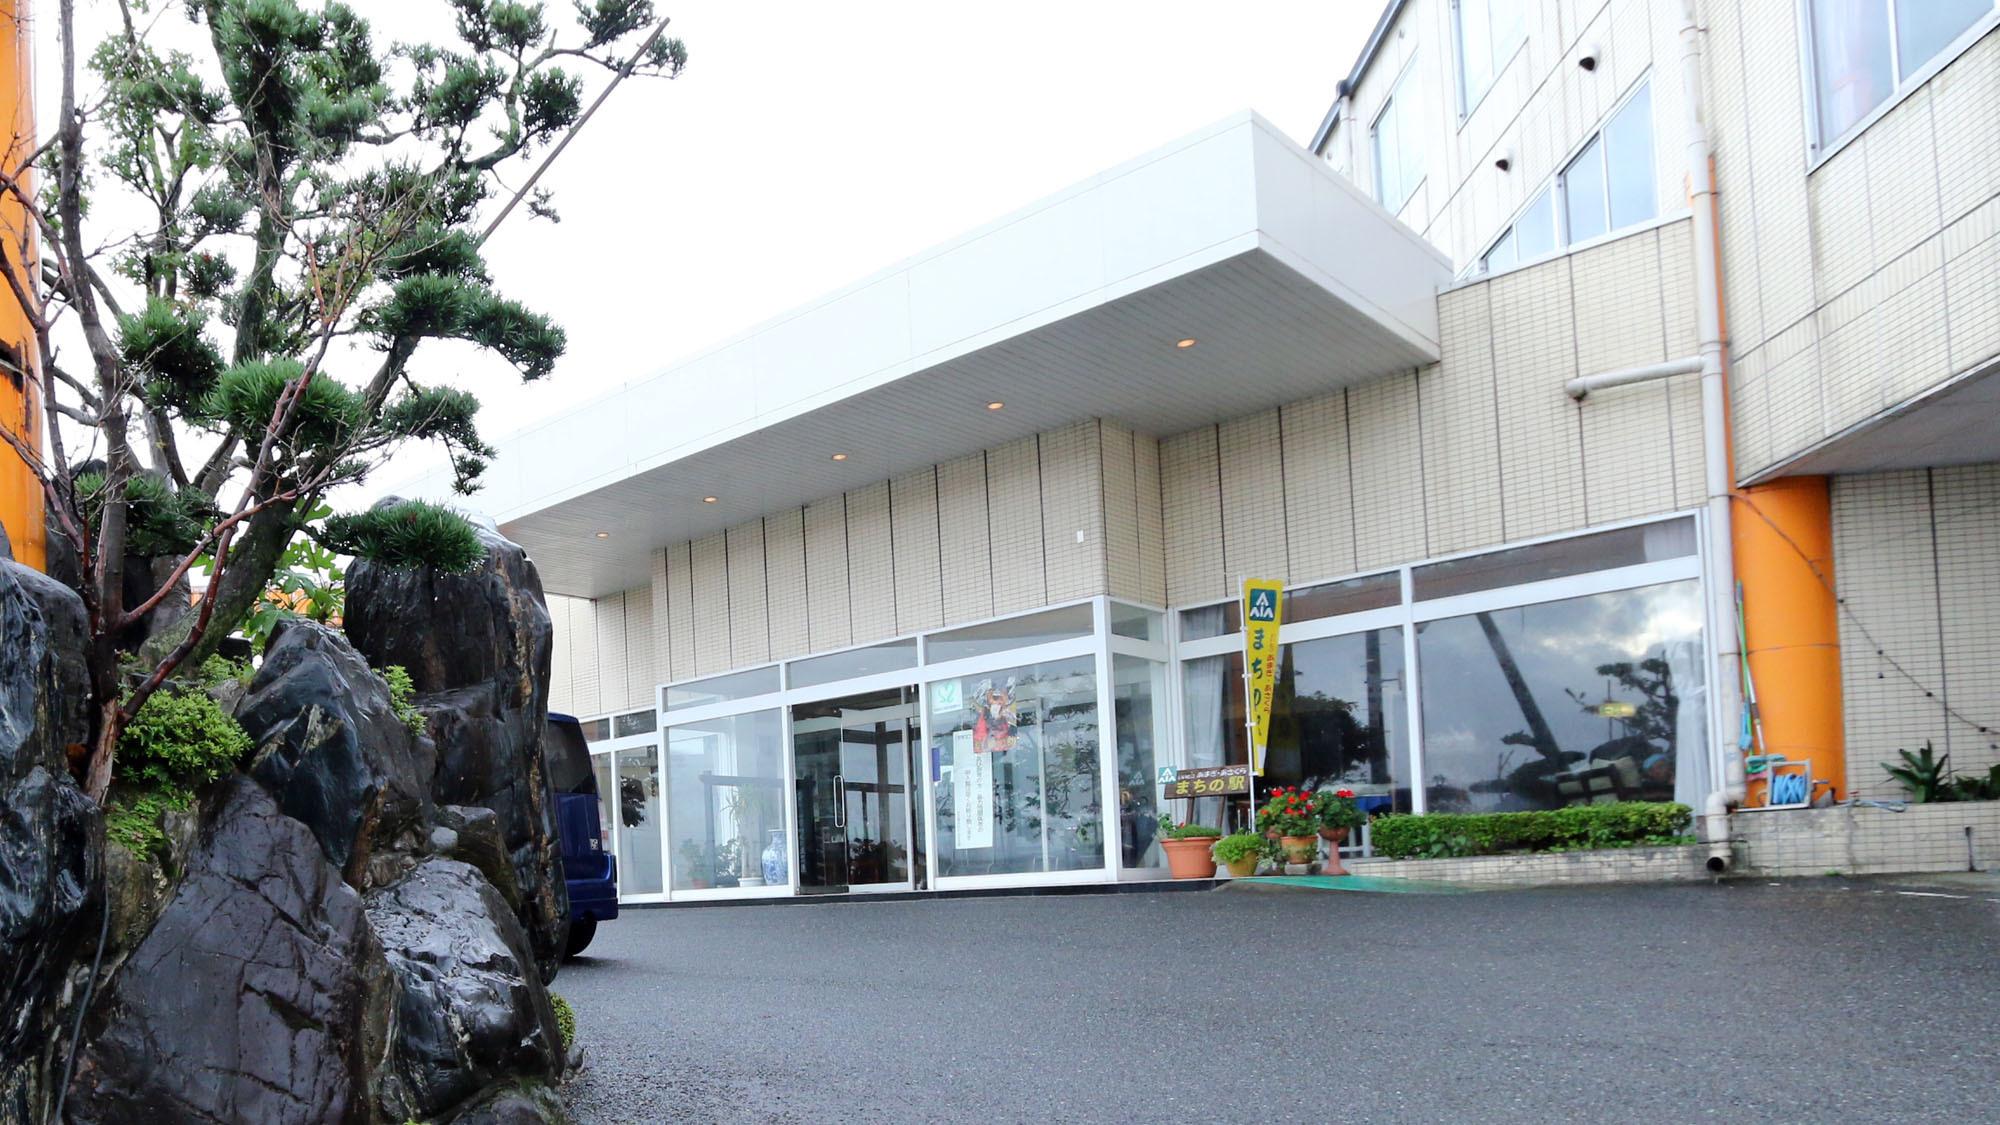 甘木観光ホテル 甘木館...